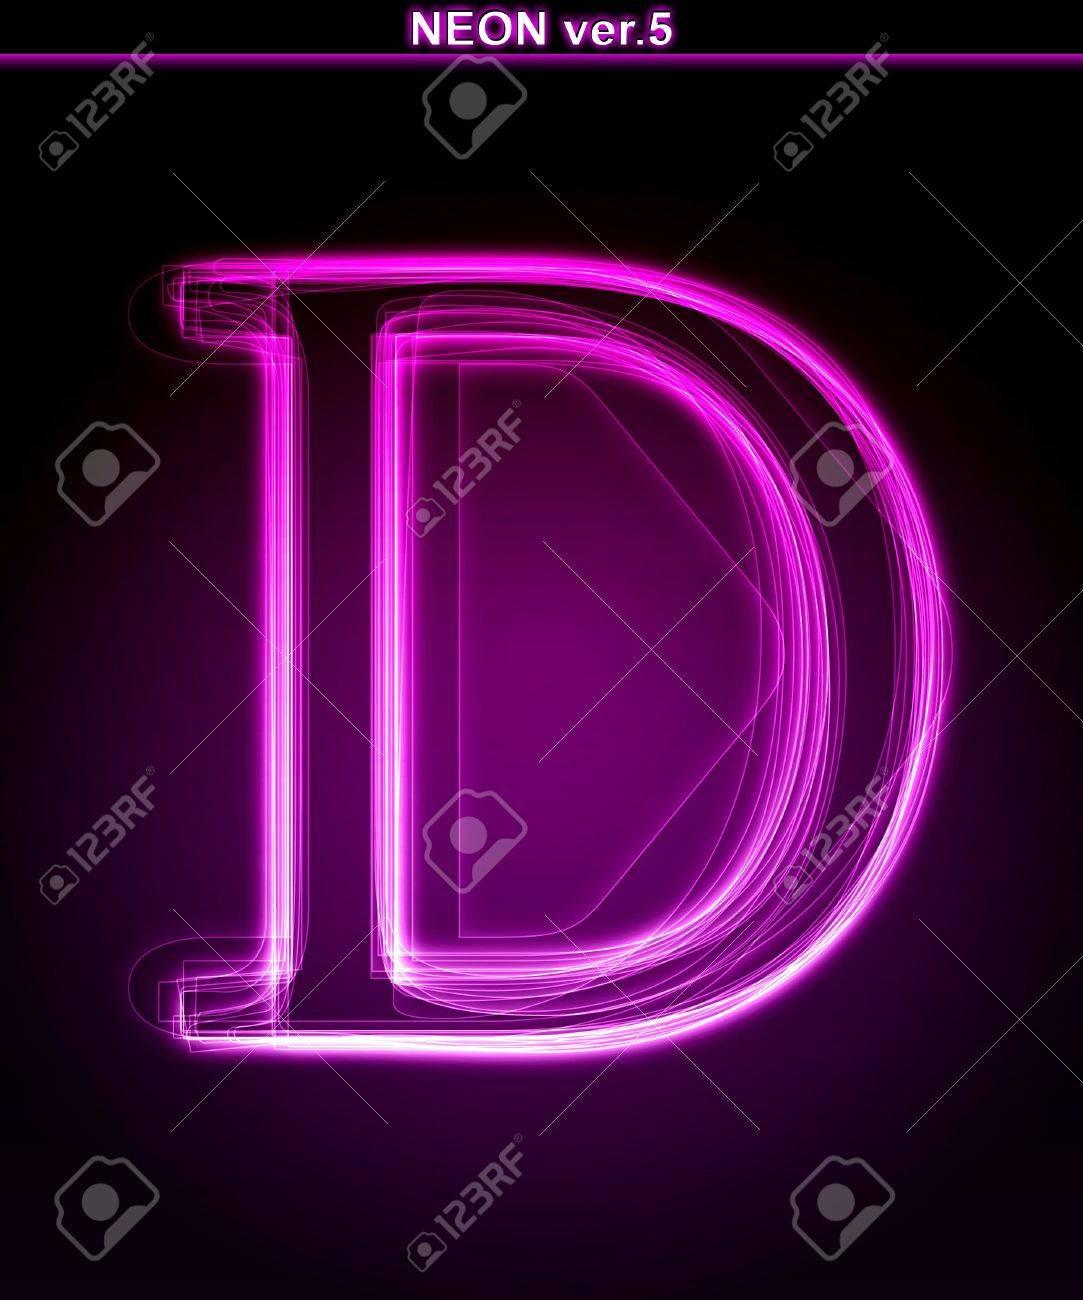 D background images - Glowing Neon Letter On Black Background Letter D Full Font In Portfolio